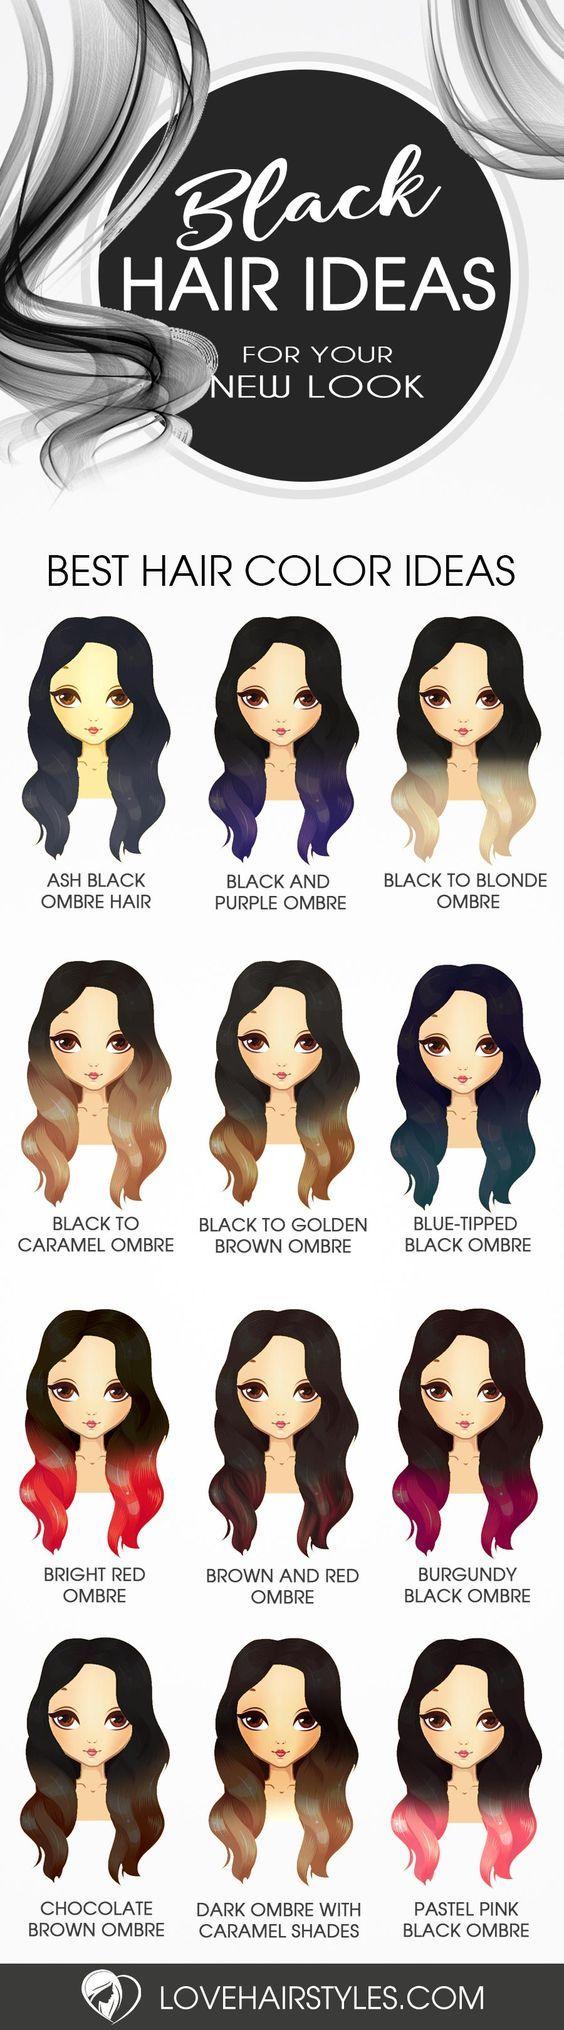 Caramel hair color boy włosy przewodnik  czarny kolorowy  hair   pinterest  hair